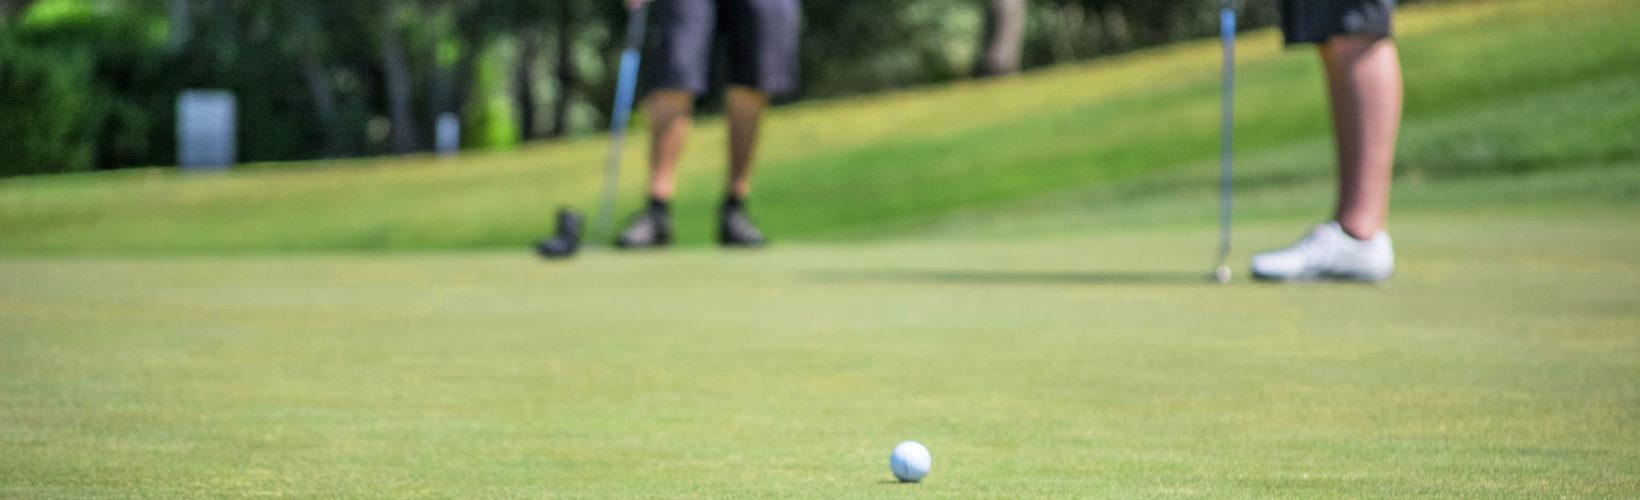 Golfa i Umeå